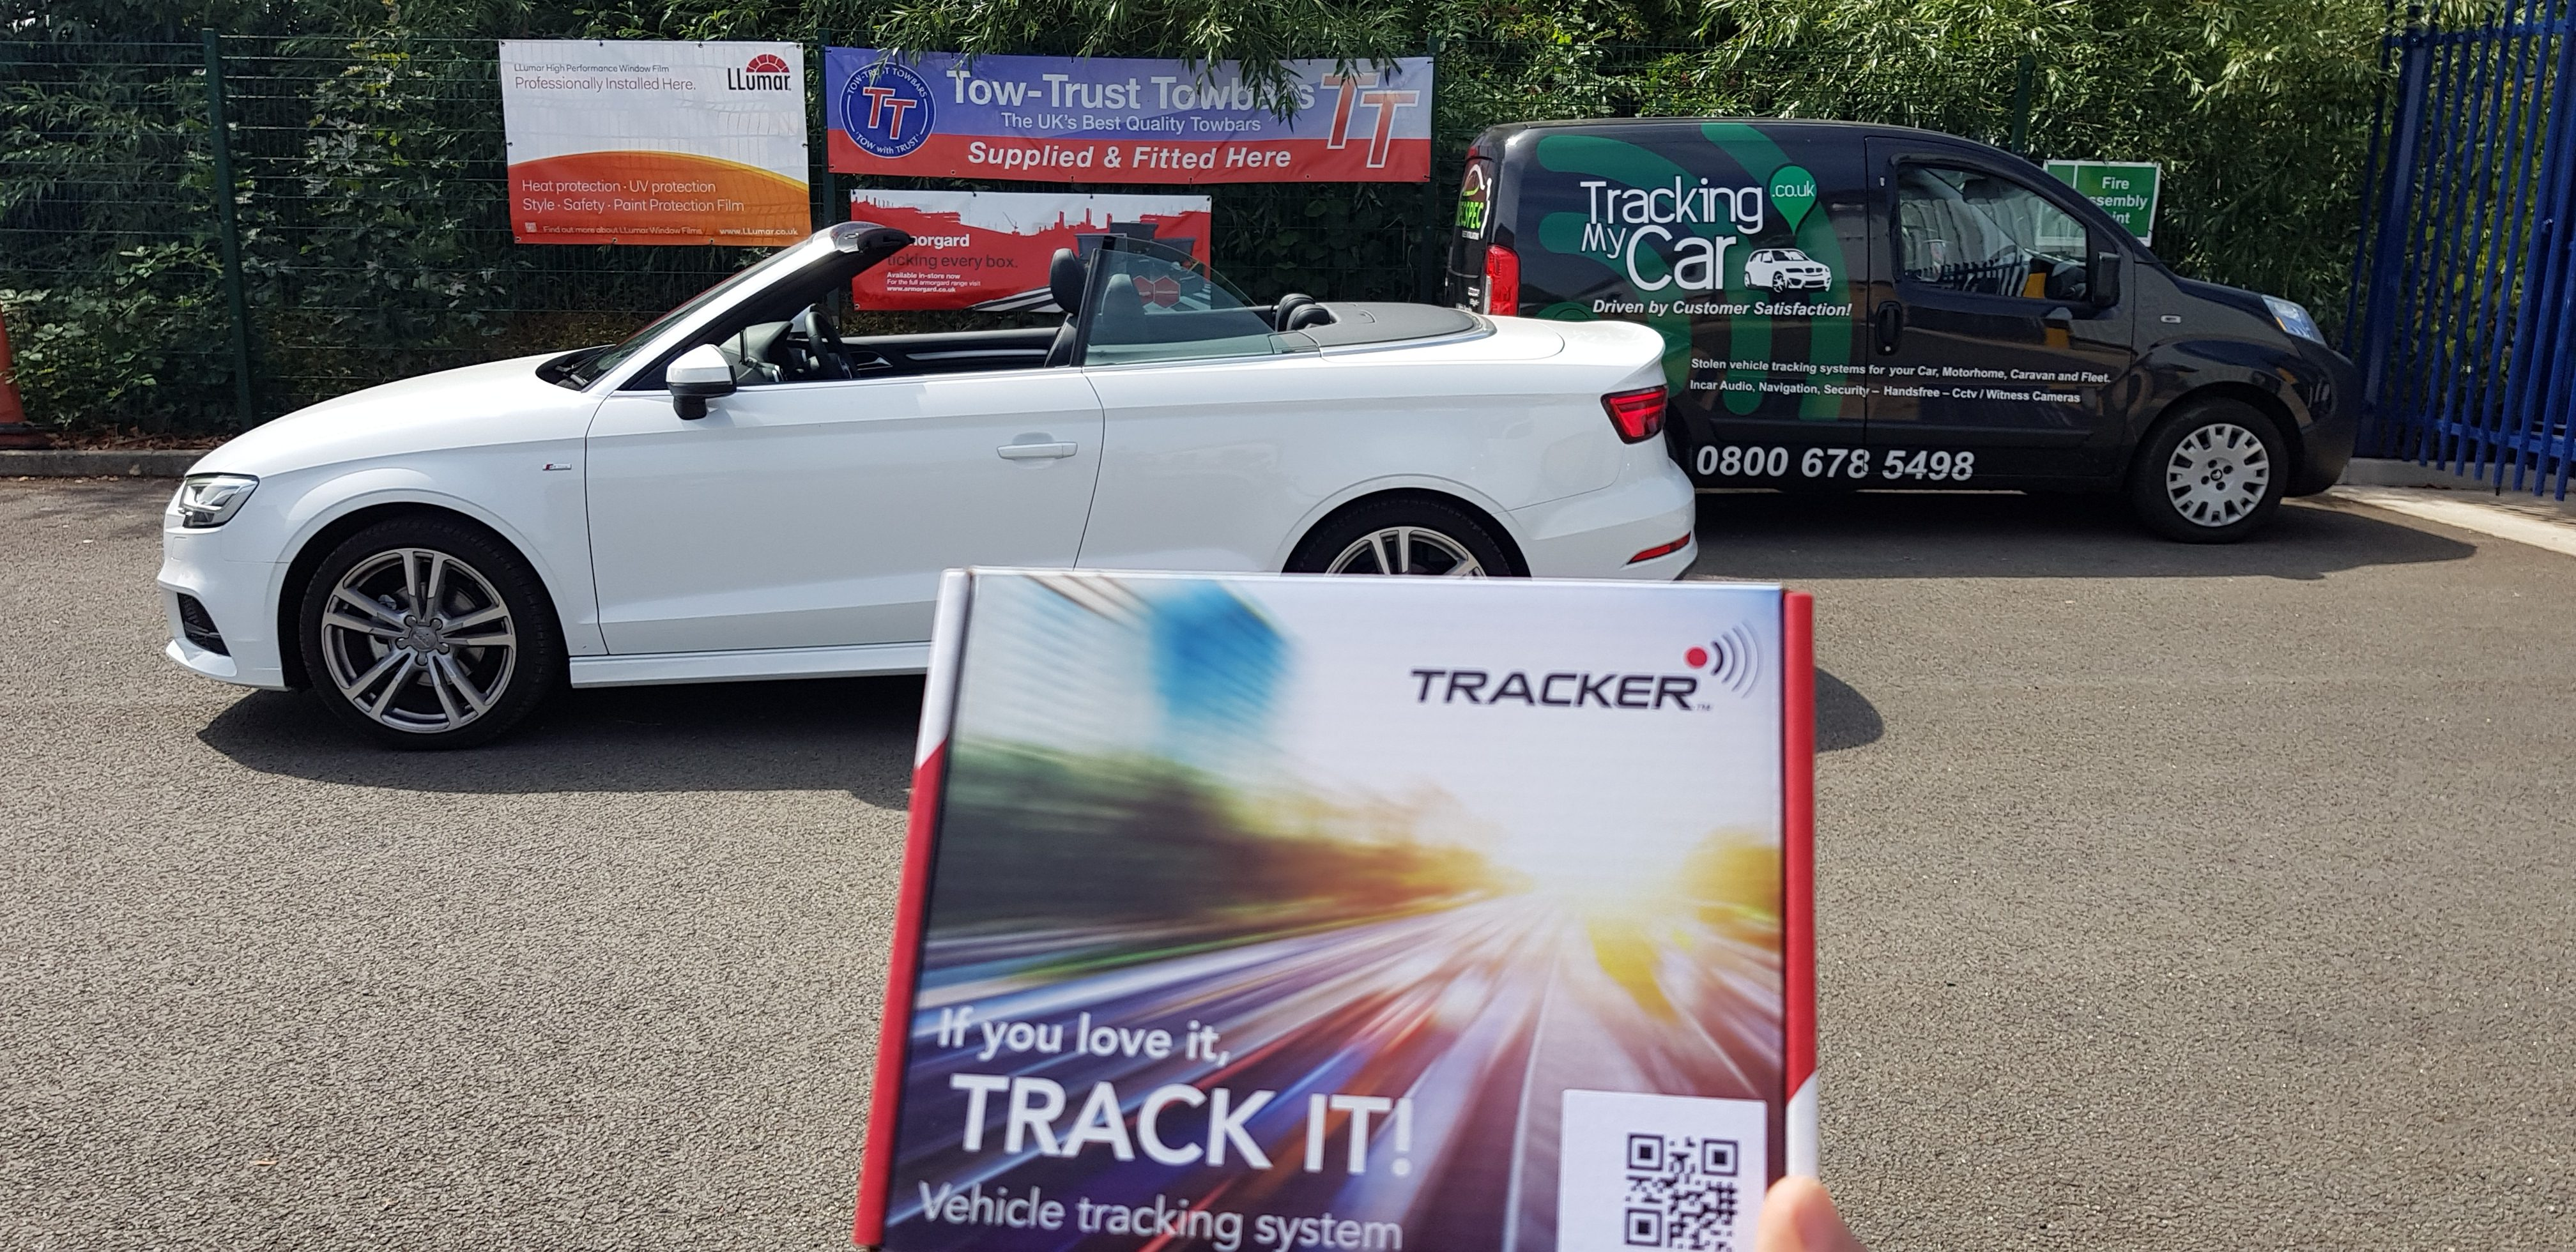 Tracker Vantage Plus Category S5